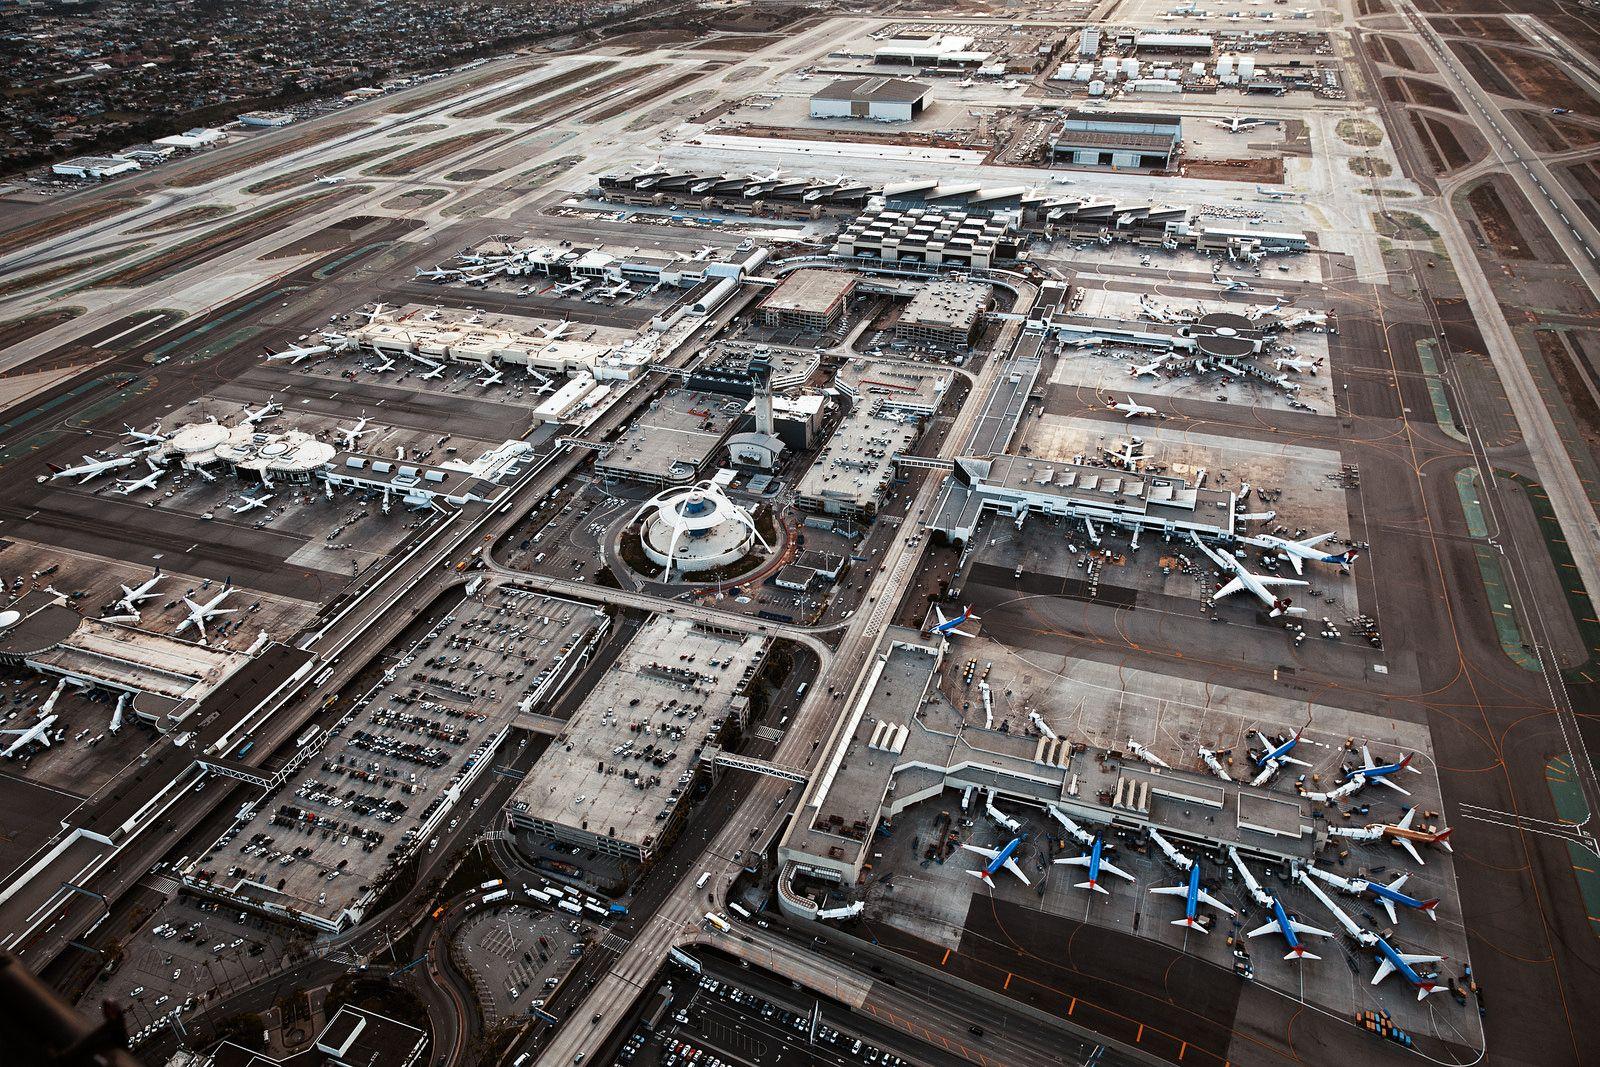 Lax Los Angeles International Airport Los Angeles City Photo